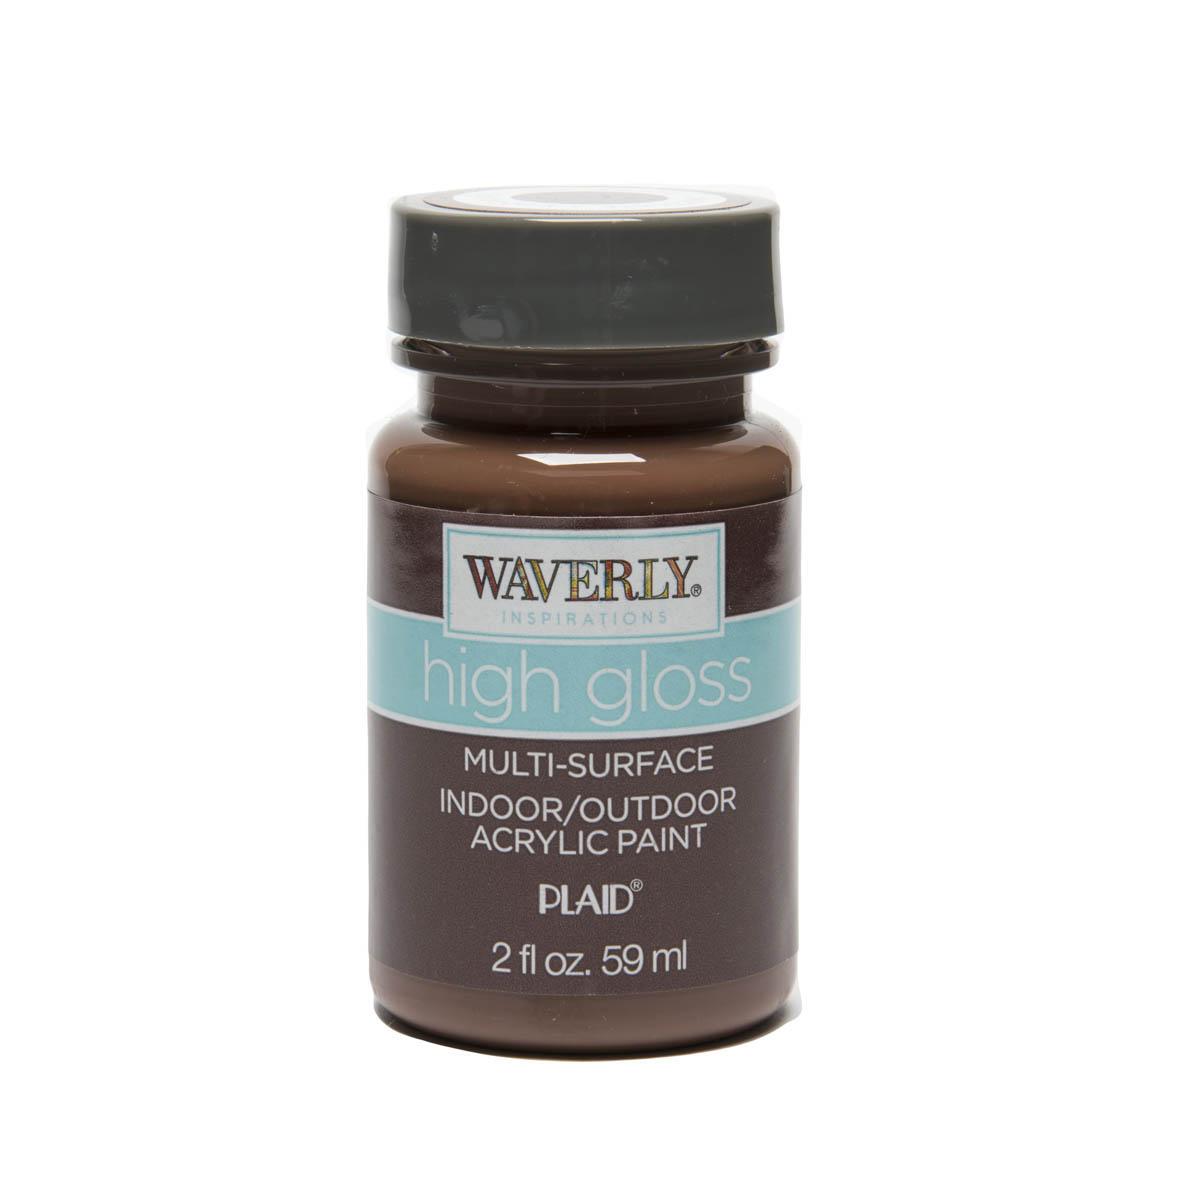 Waverly ® Inspirations High Gloss Multi-Surface Acrylic Paint - Chocolate, 2 oz.